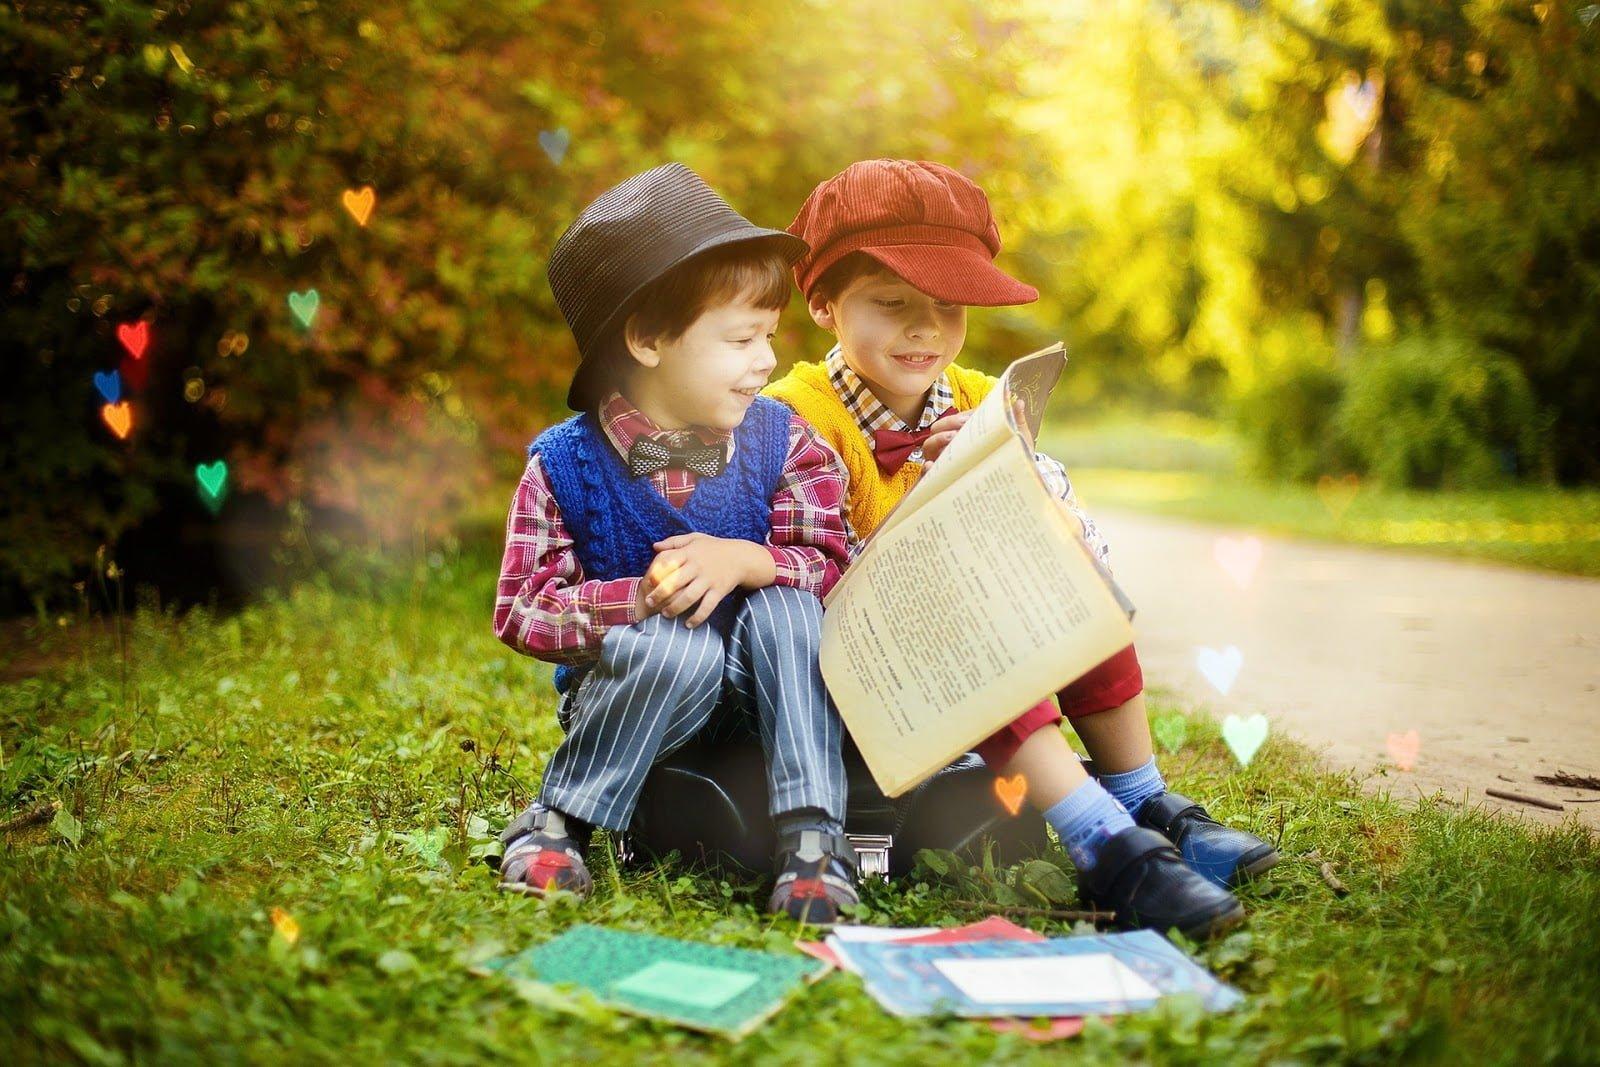 Children reading on grass